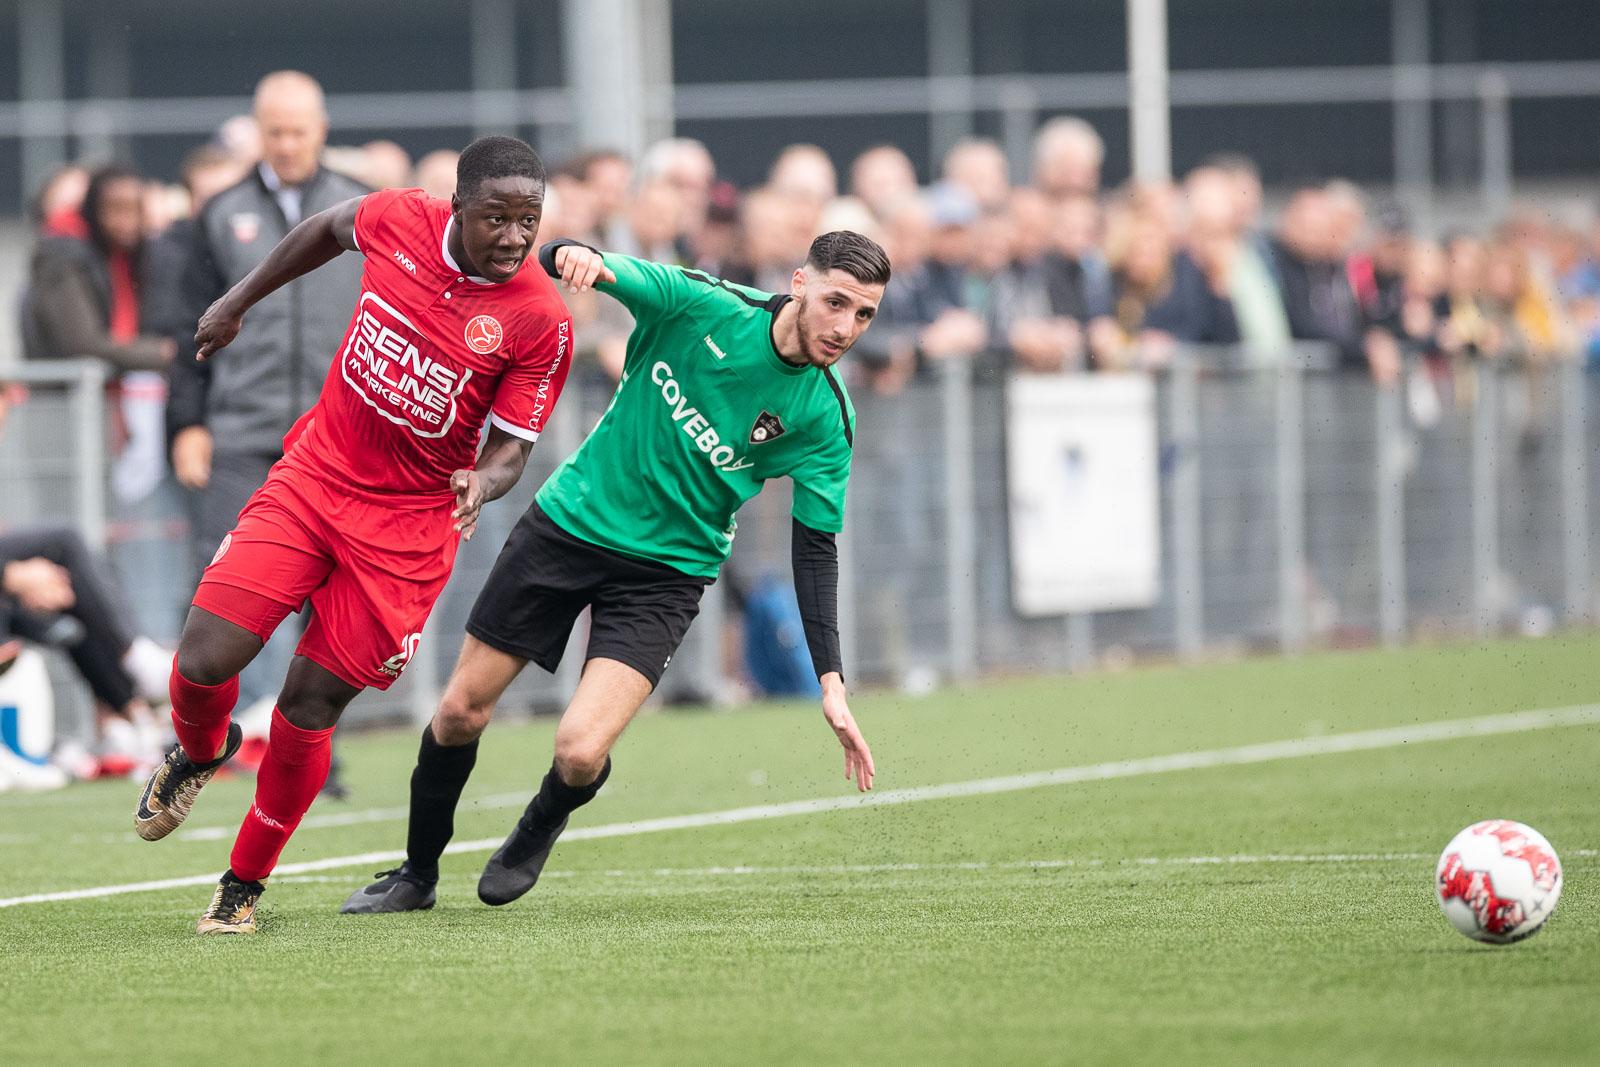 Almere City FC haalt ook tegen FC Almere de dubbele cijfers